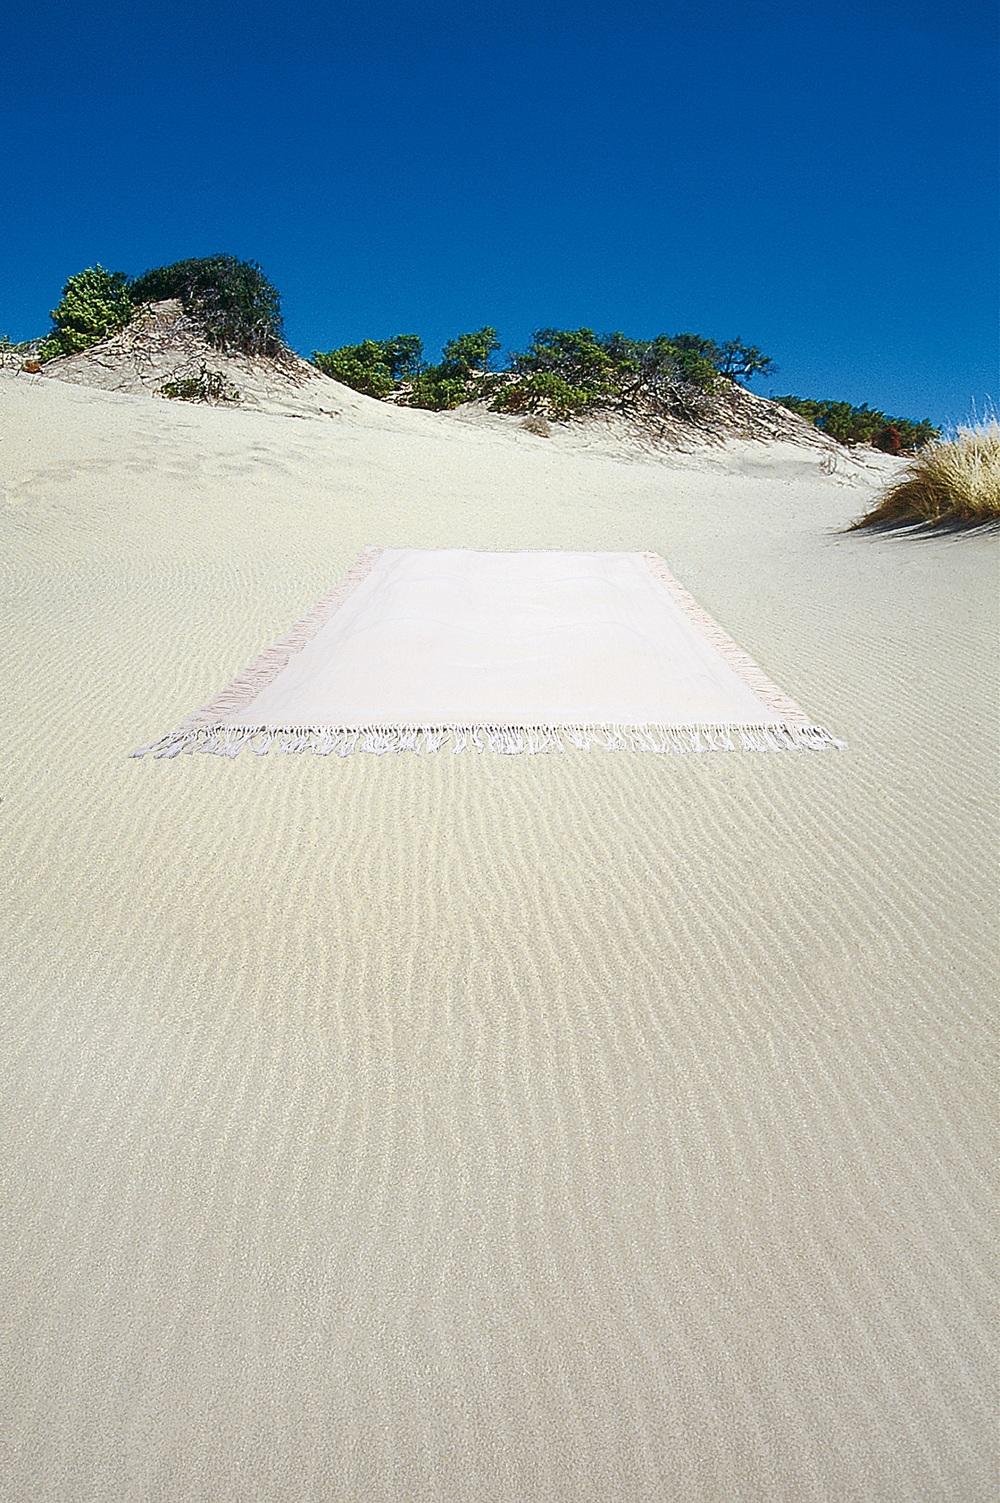 tappeto Samugheo su dune 1 DEF (1).JPG